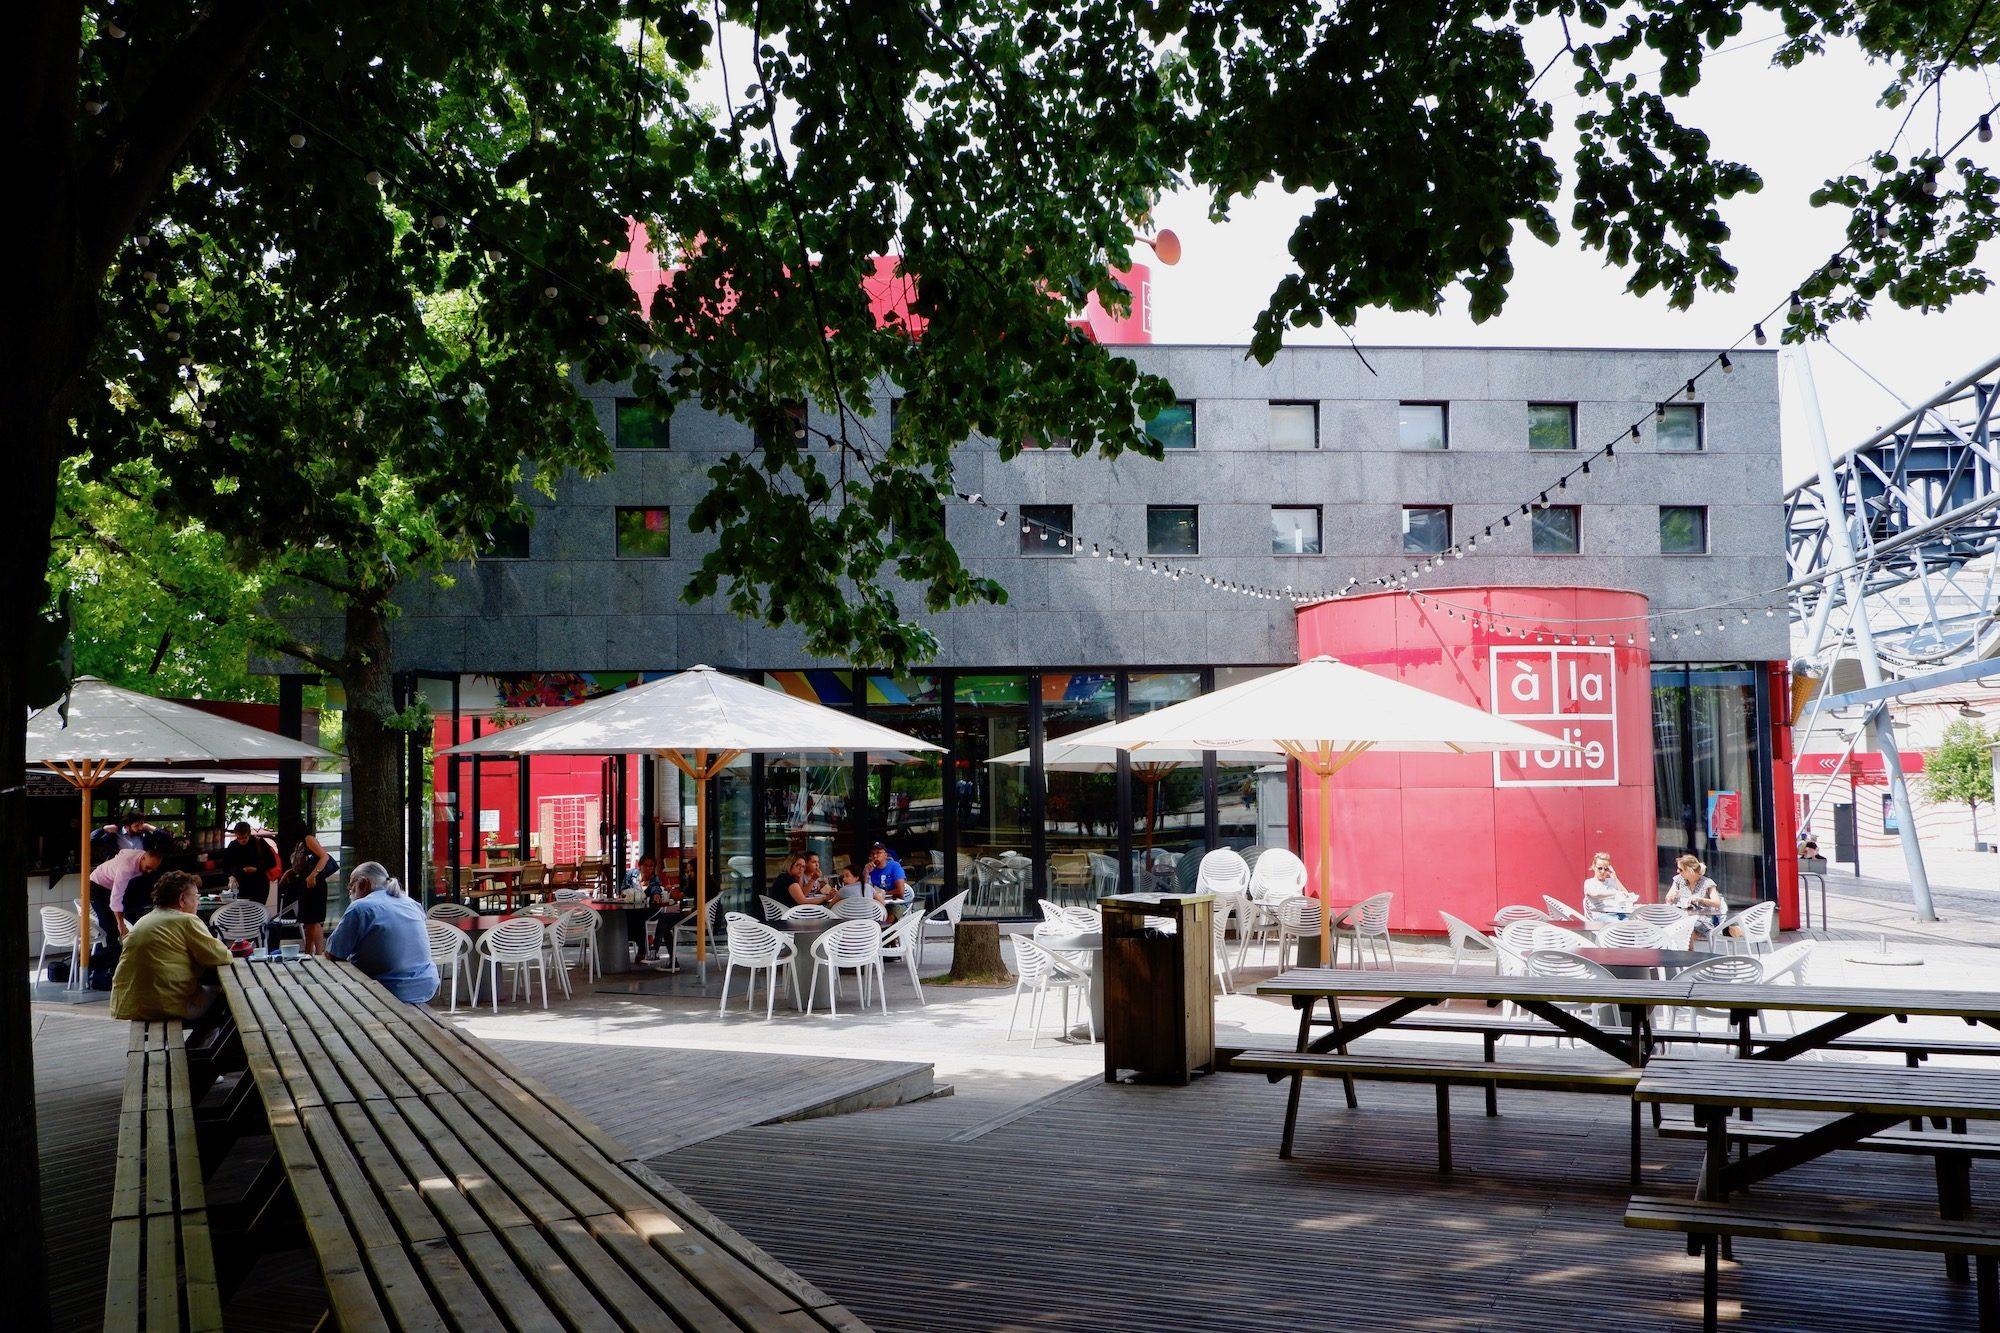 La Villette Park with its numerous bars and cultural venues just northwards along the canal de l'Ourcq.